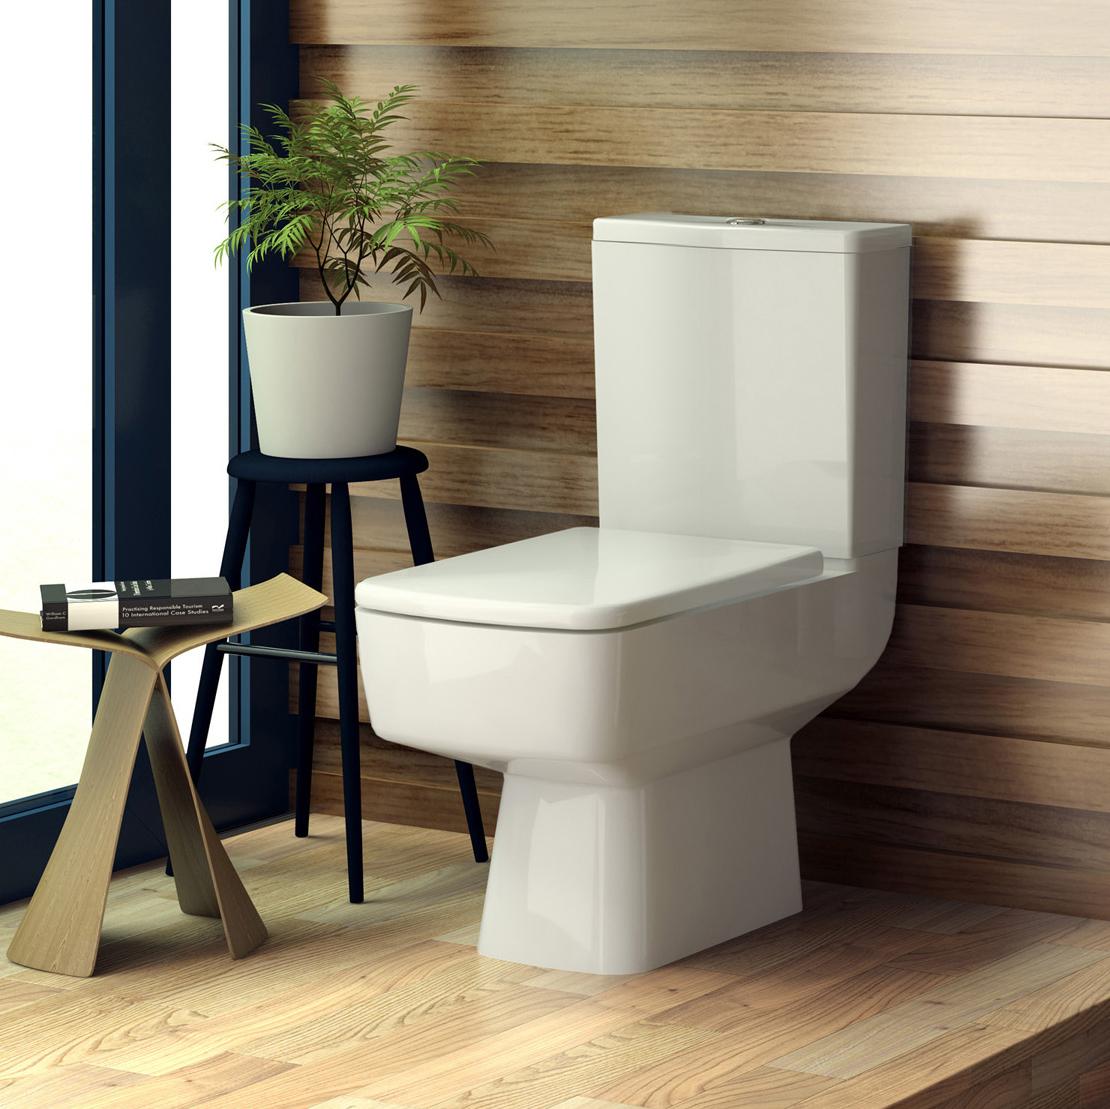 Milano Farington Toilet, Cistern and Soft Close Seat